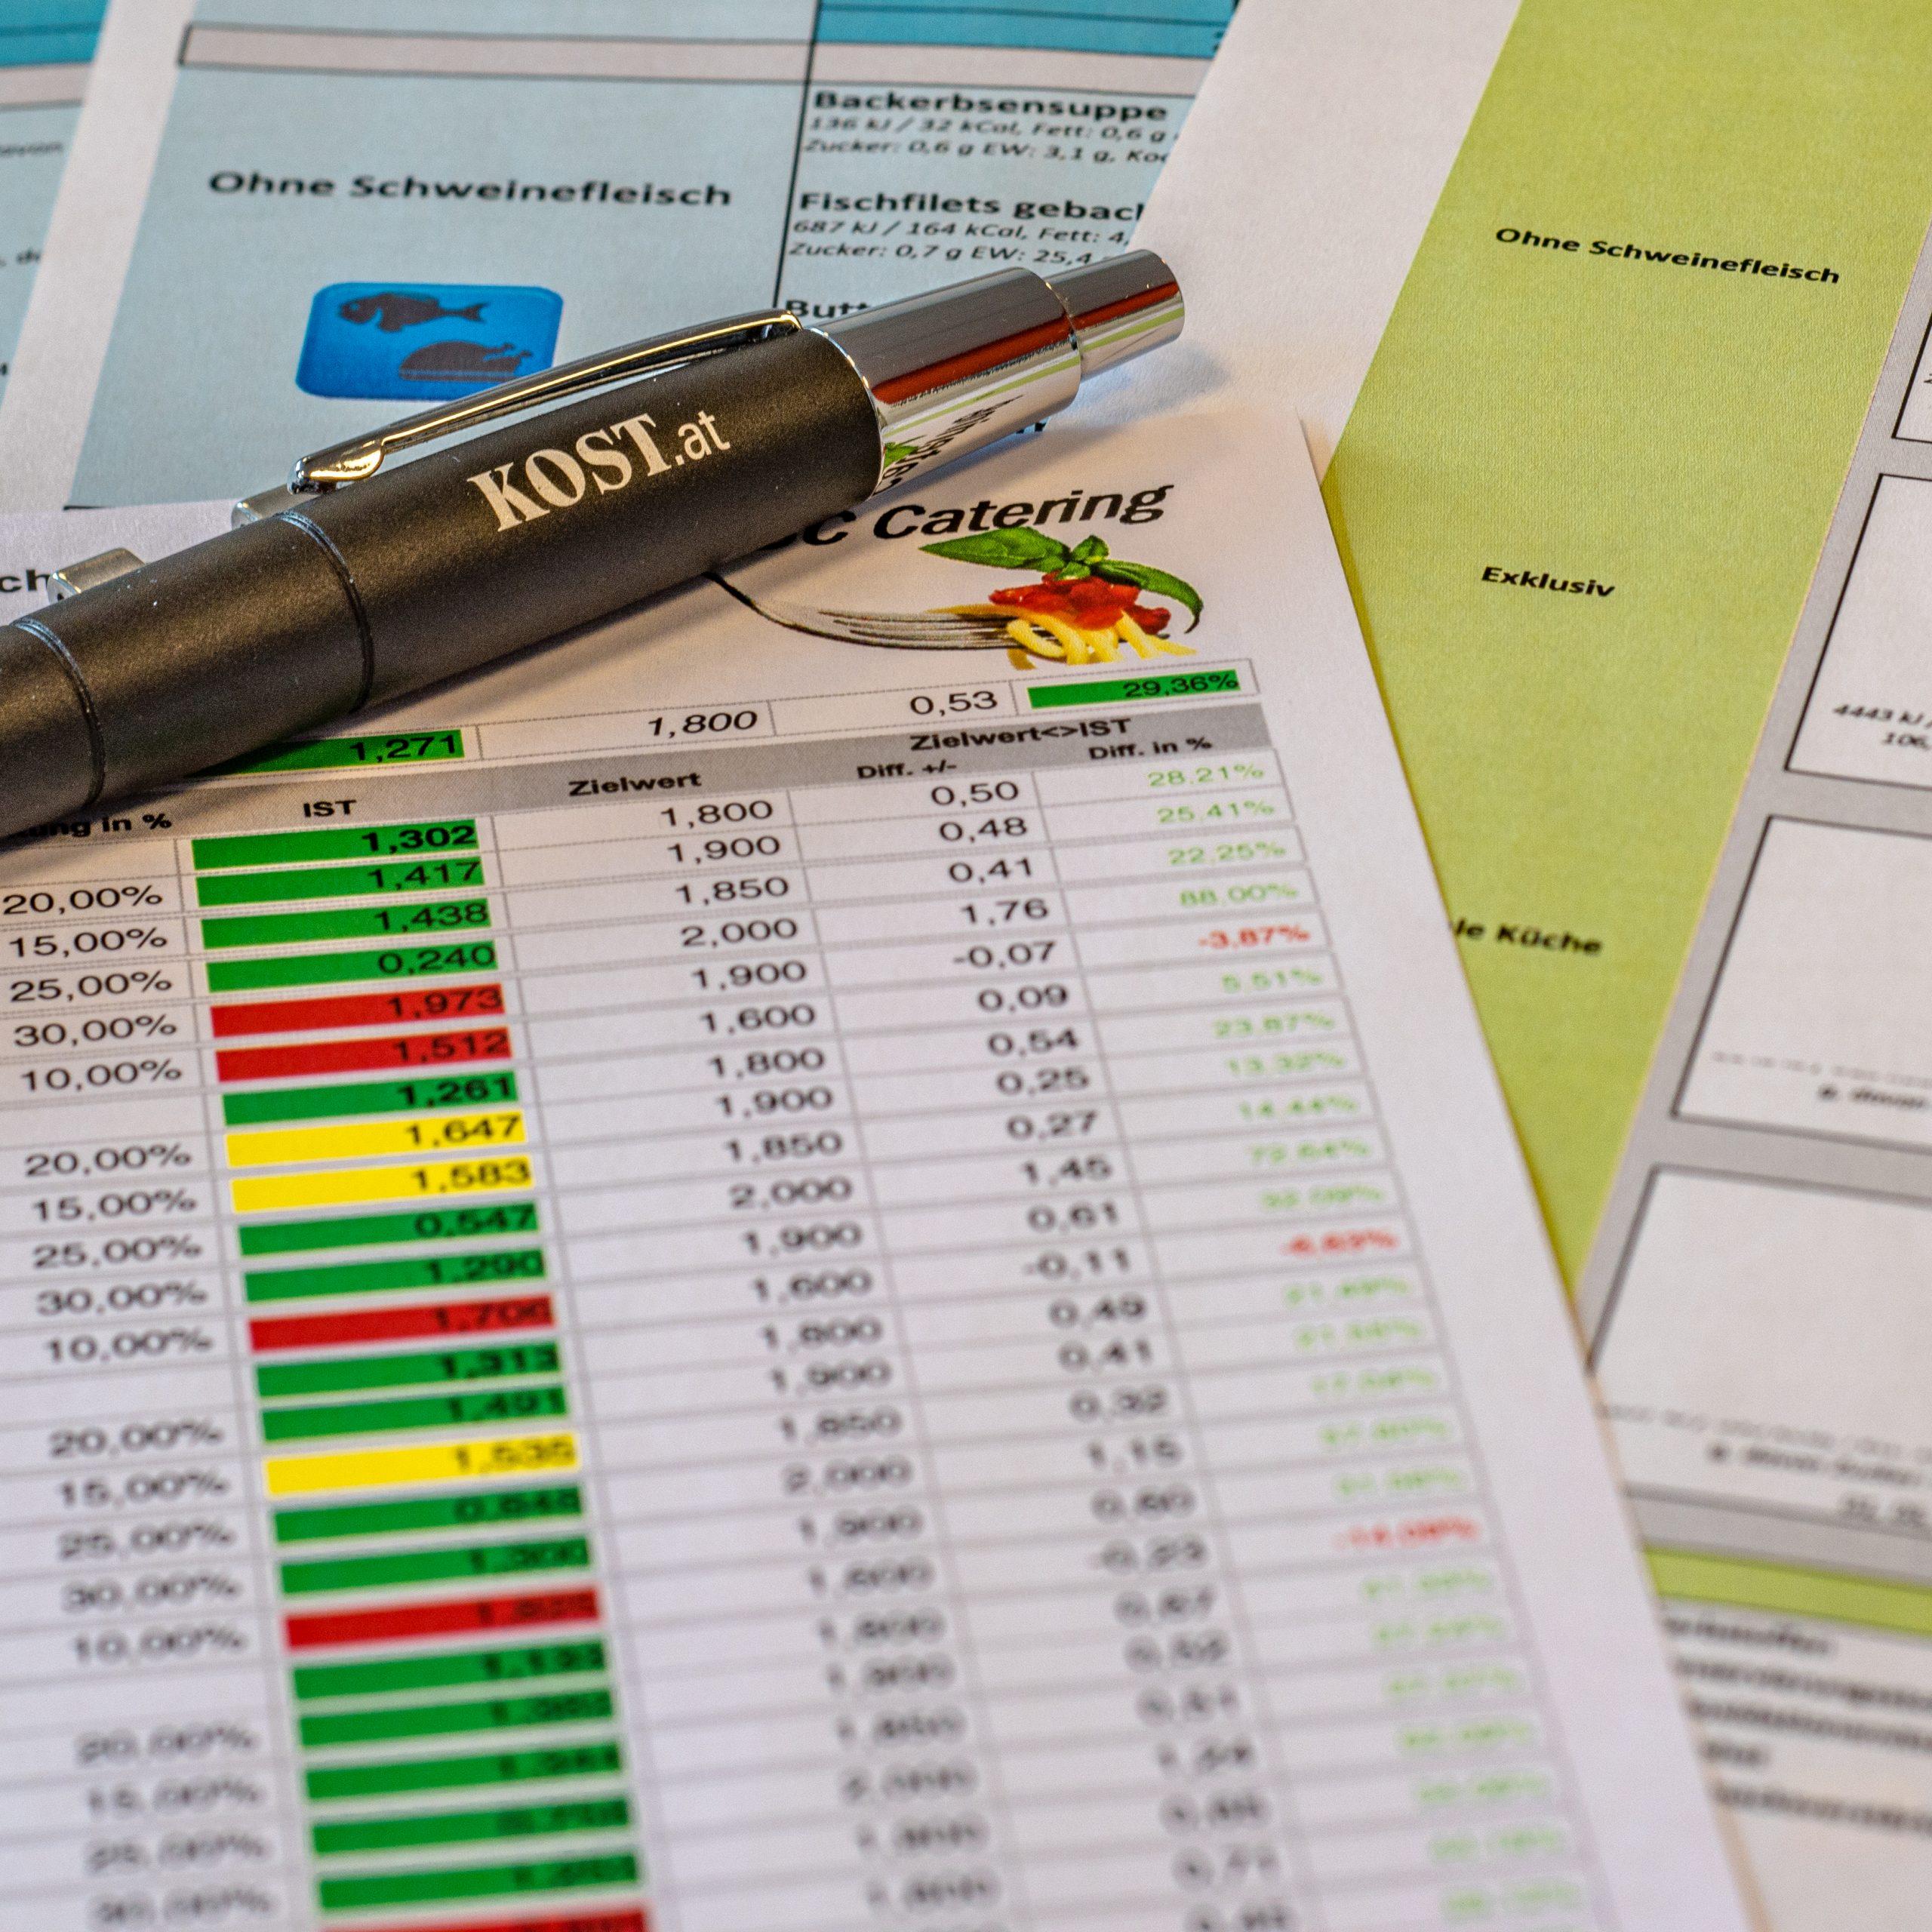 KOST Business Software | WEB11 Kalkulation1 scaled 1